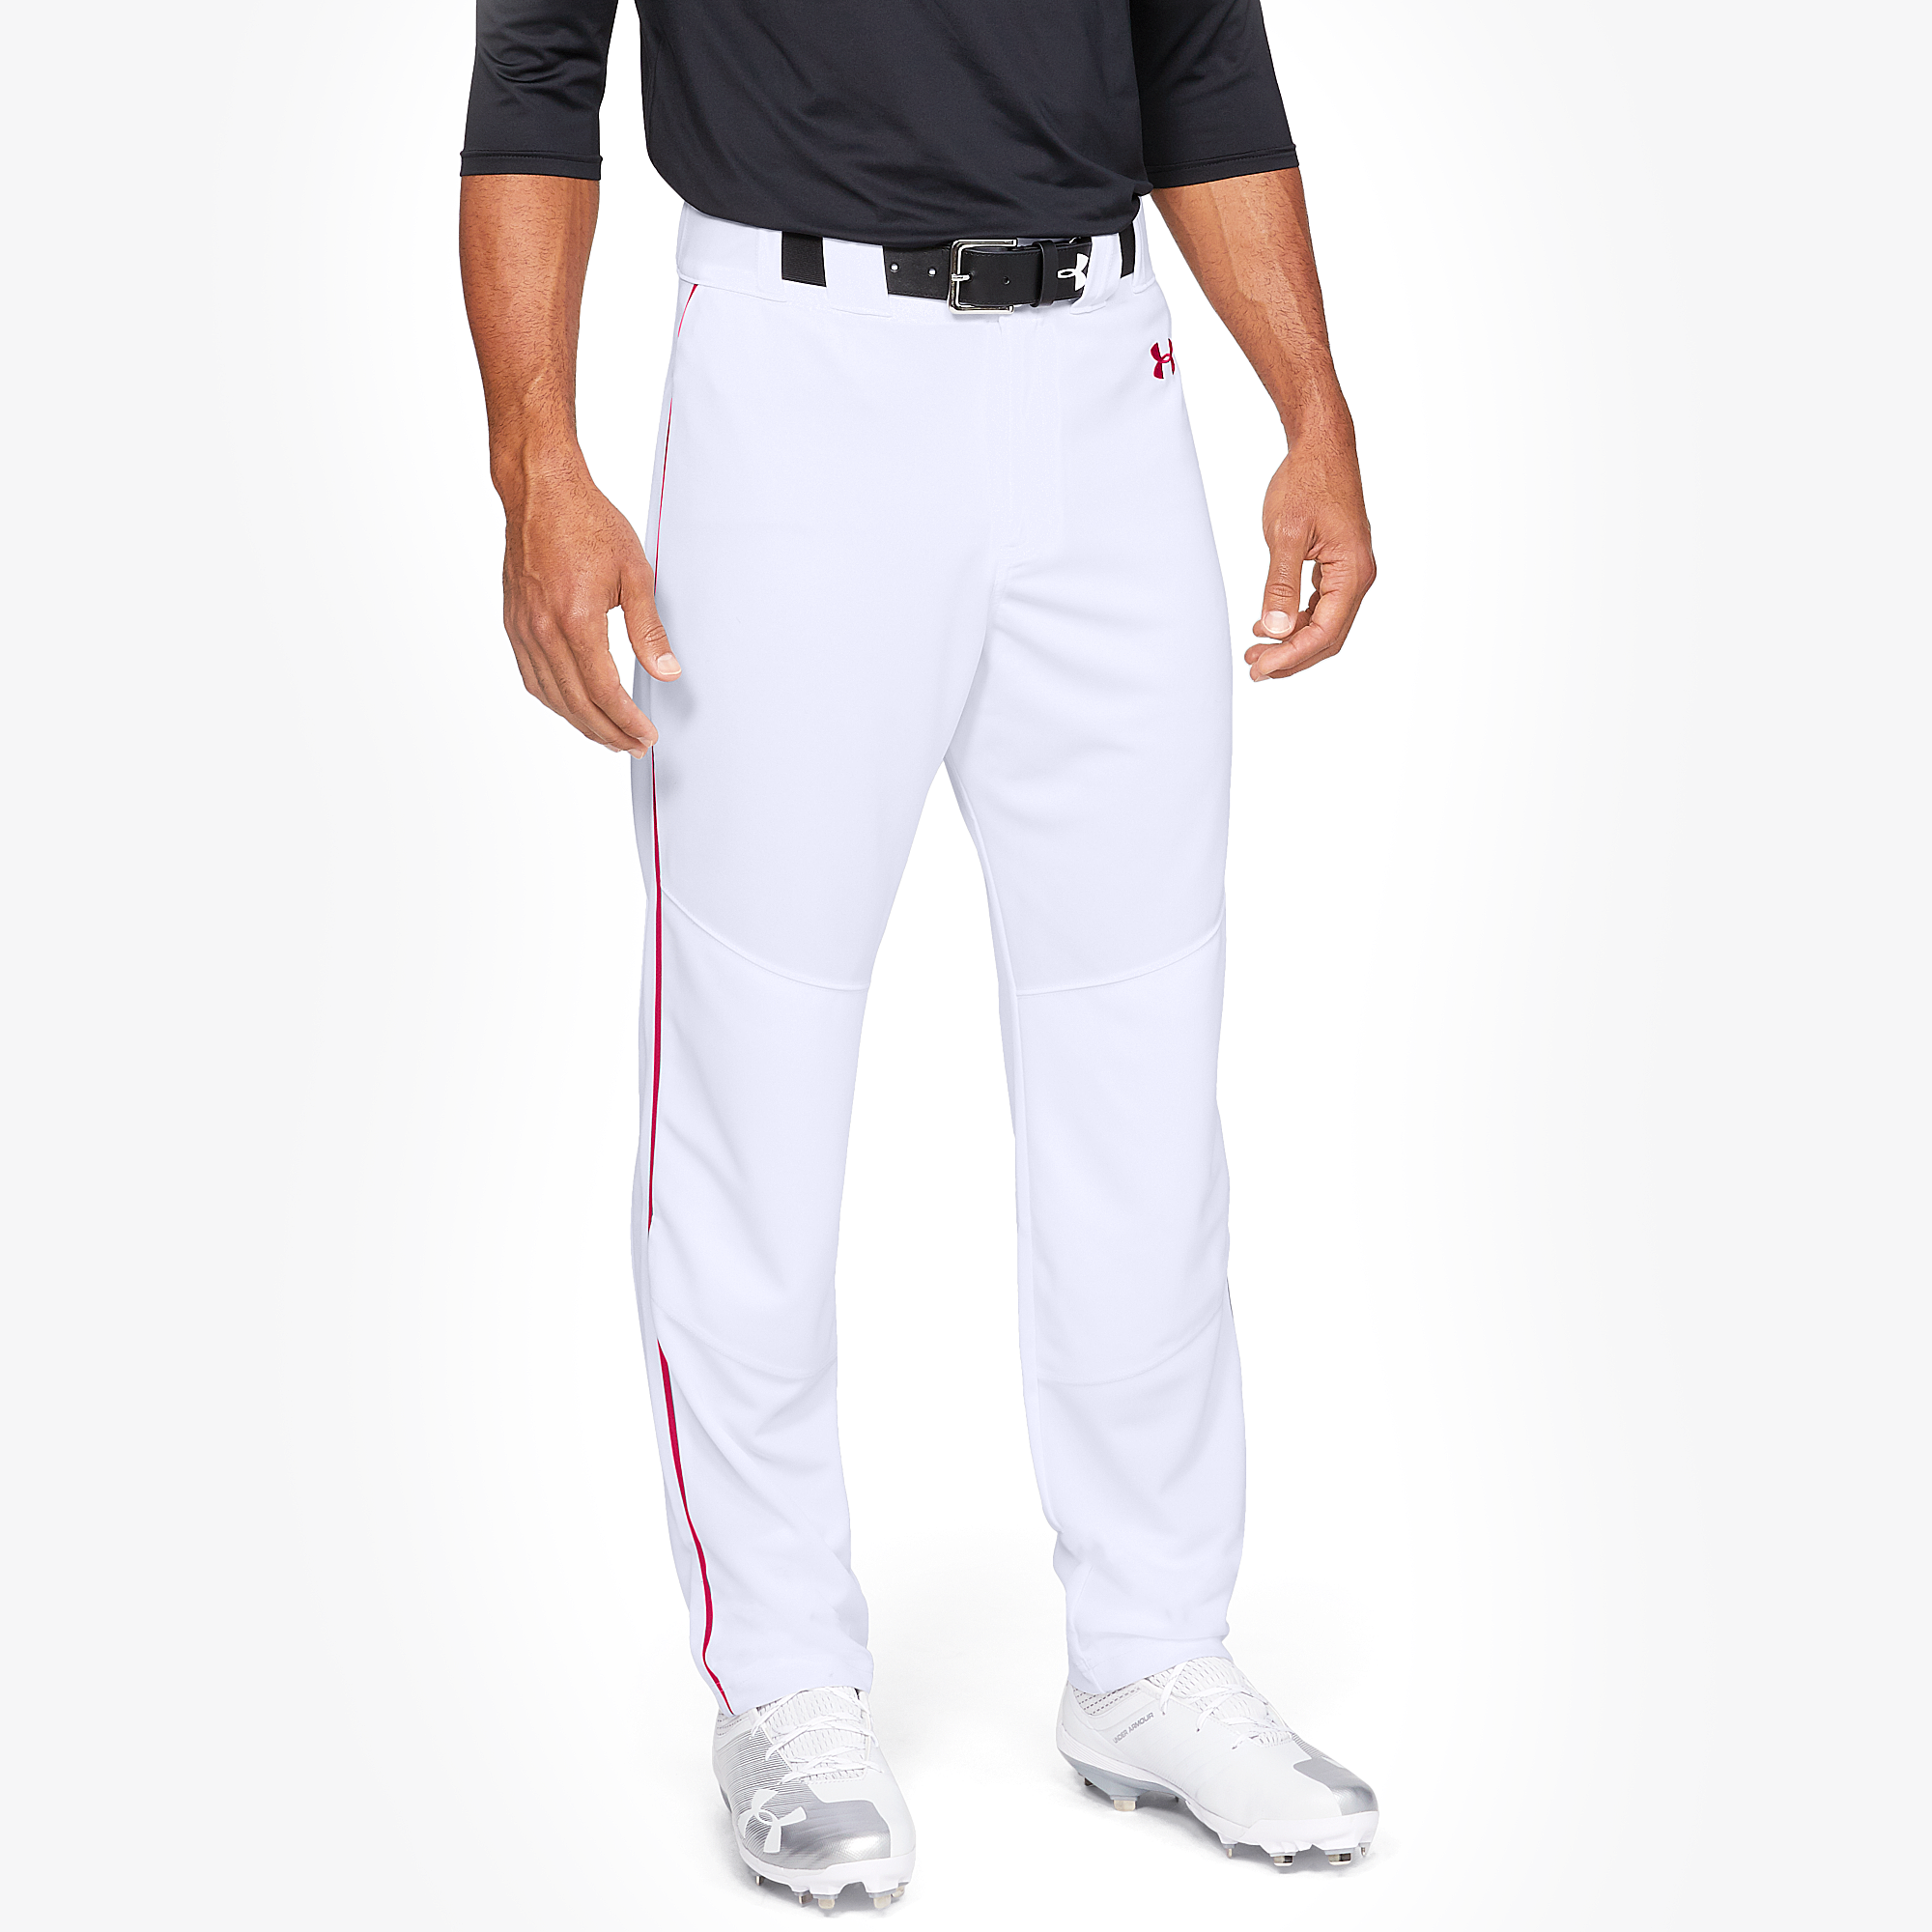 Under Armour Garçons GRAY UA utilitaire fond ouvert Décontracté Baseball Pantalon